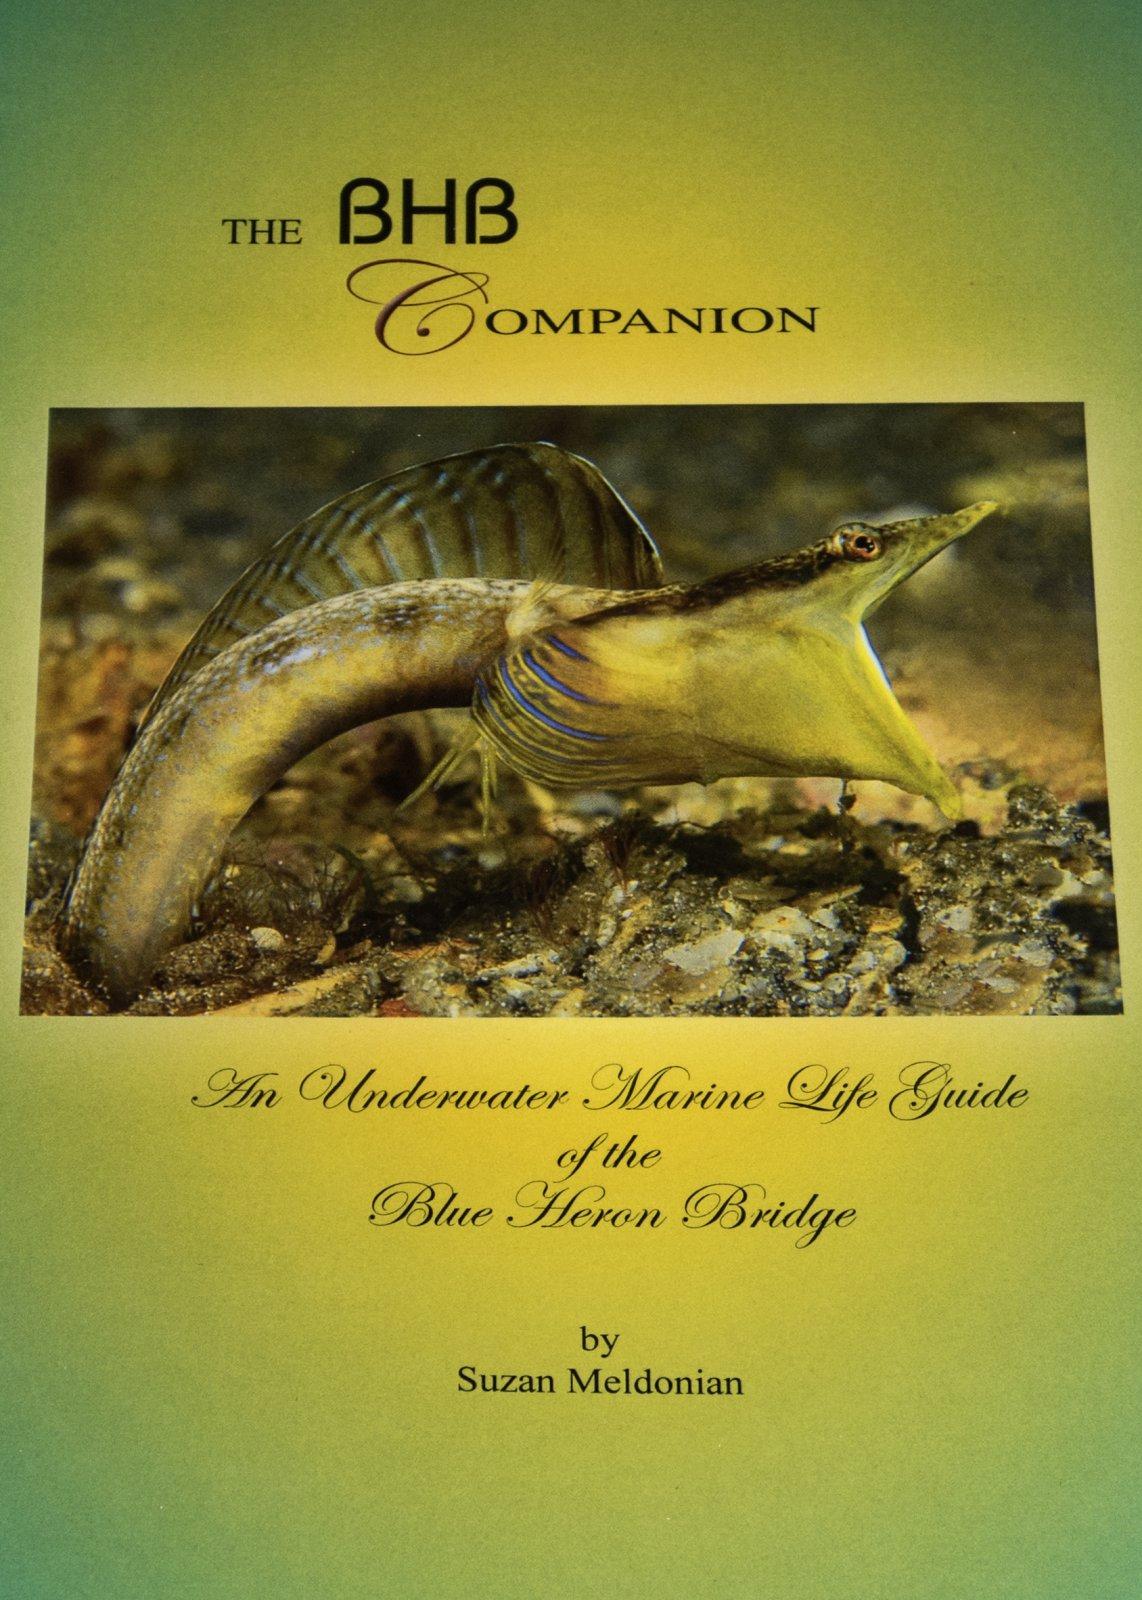 The Blue Heron Bridge Companion